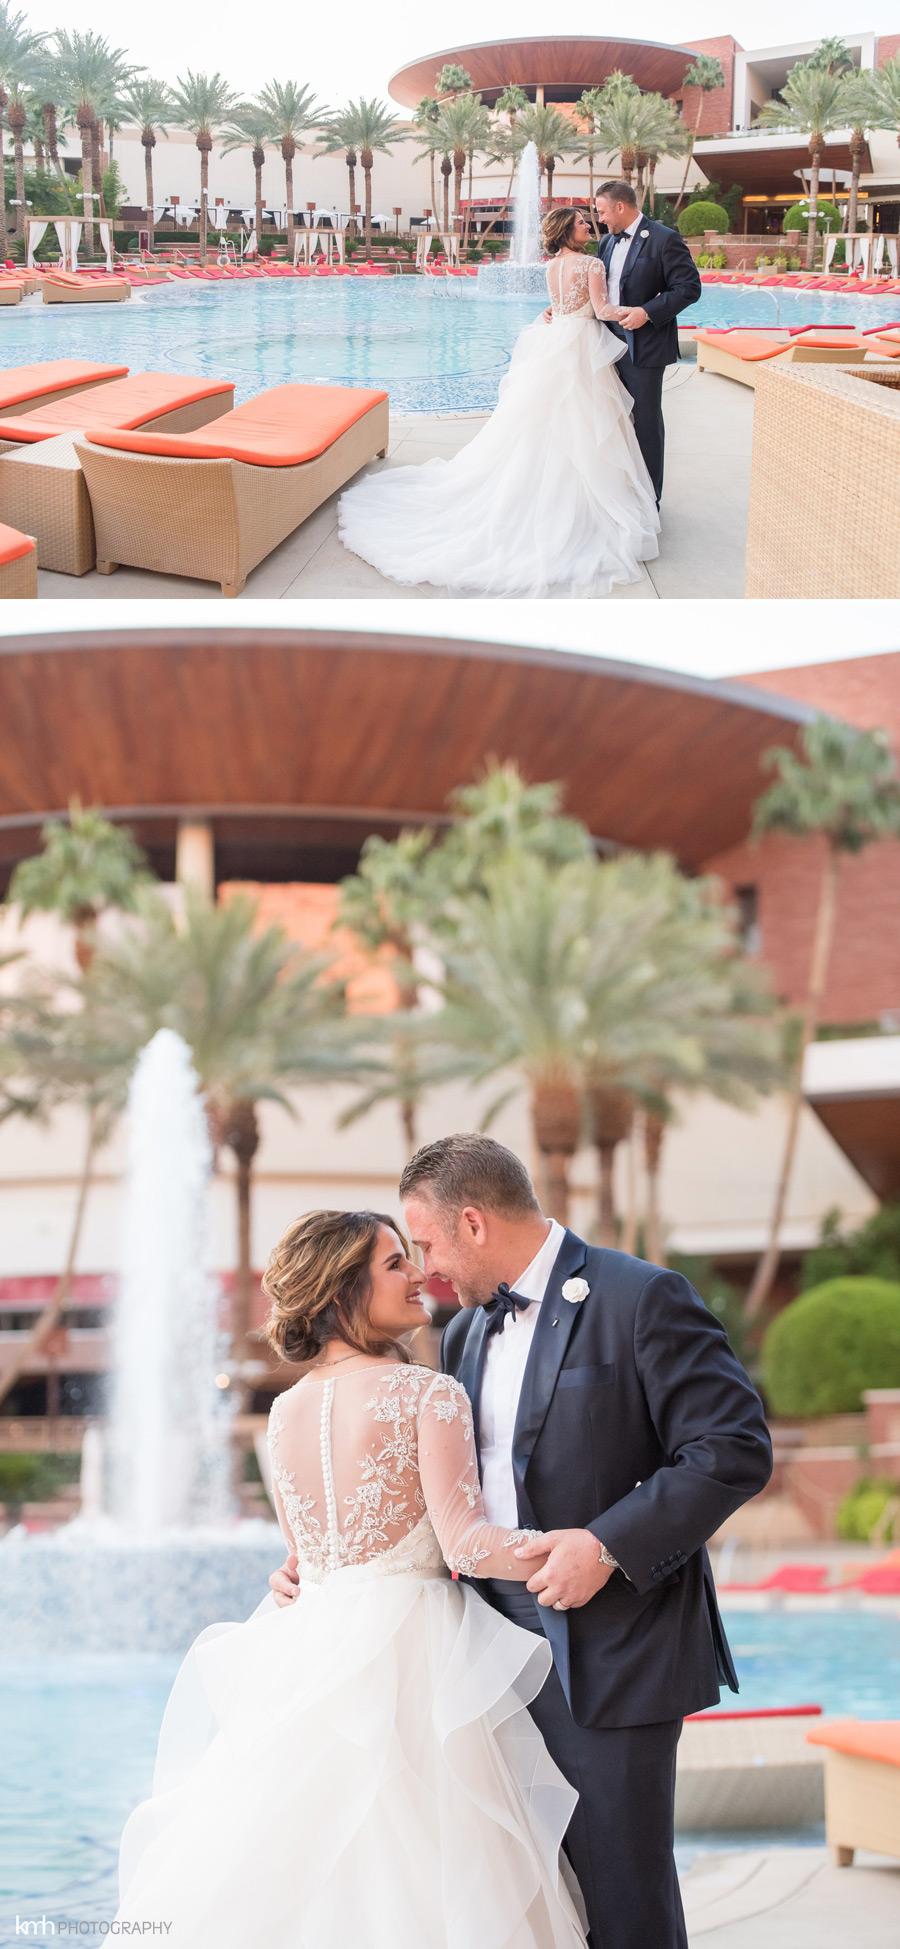 Kristin + Spencer | Elegant Red Rock Resort Wedding | KMH Photography, Las Vegas Wedding Photographer